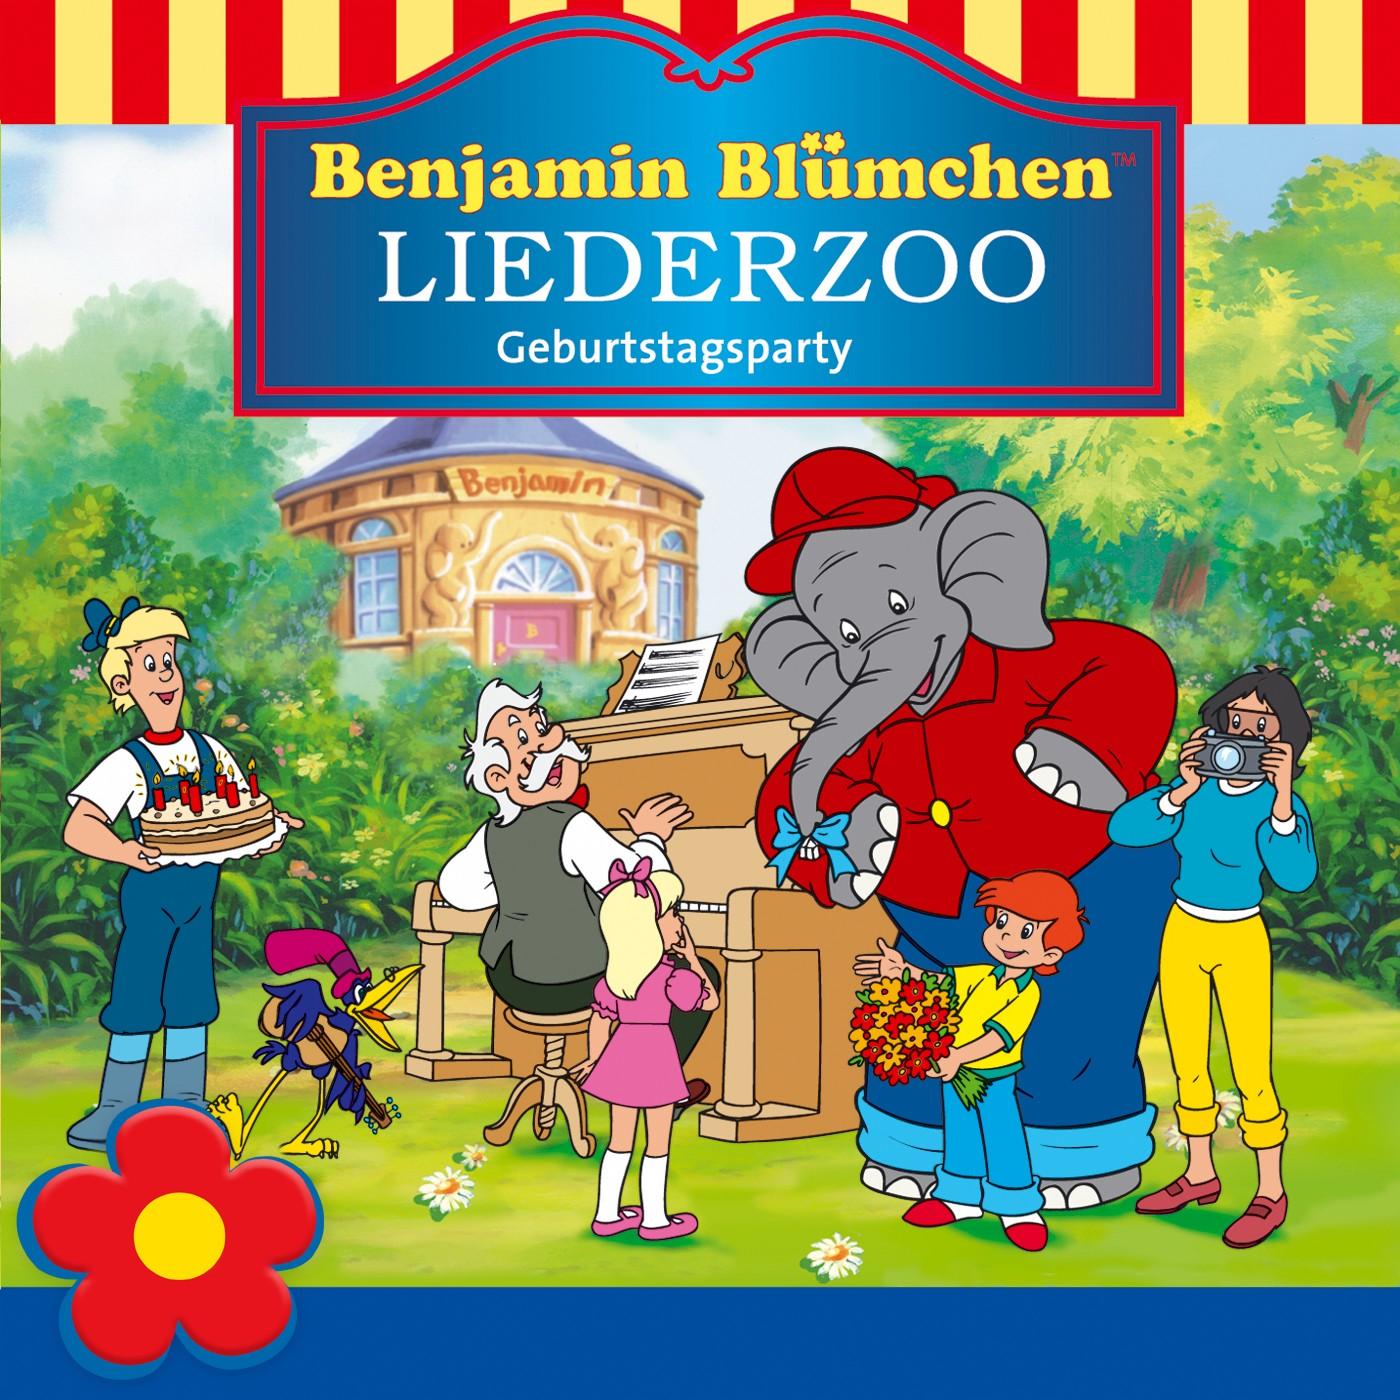 Benjamin Blümchen: Liederzoo Geburtstagsparty